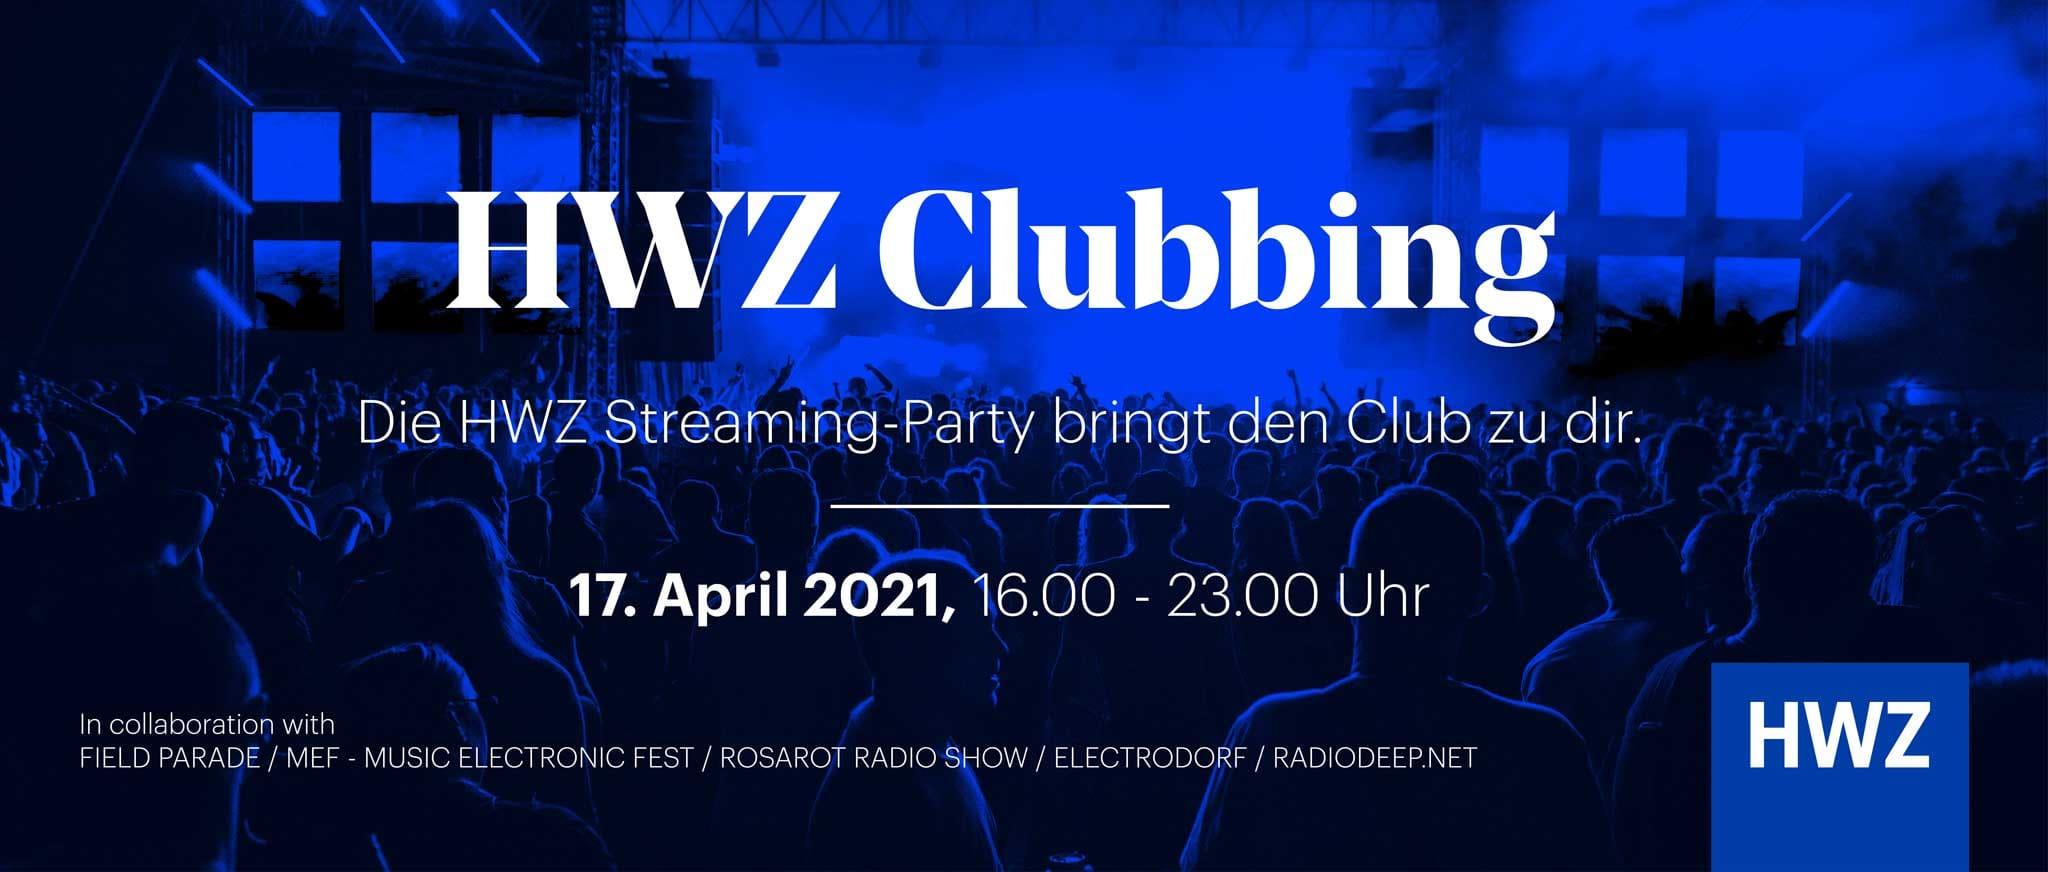 HWZ Clubbing